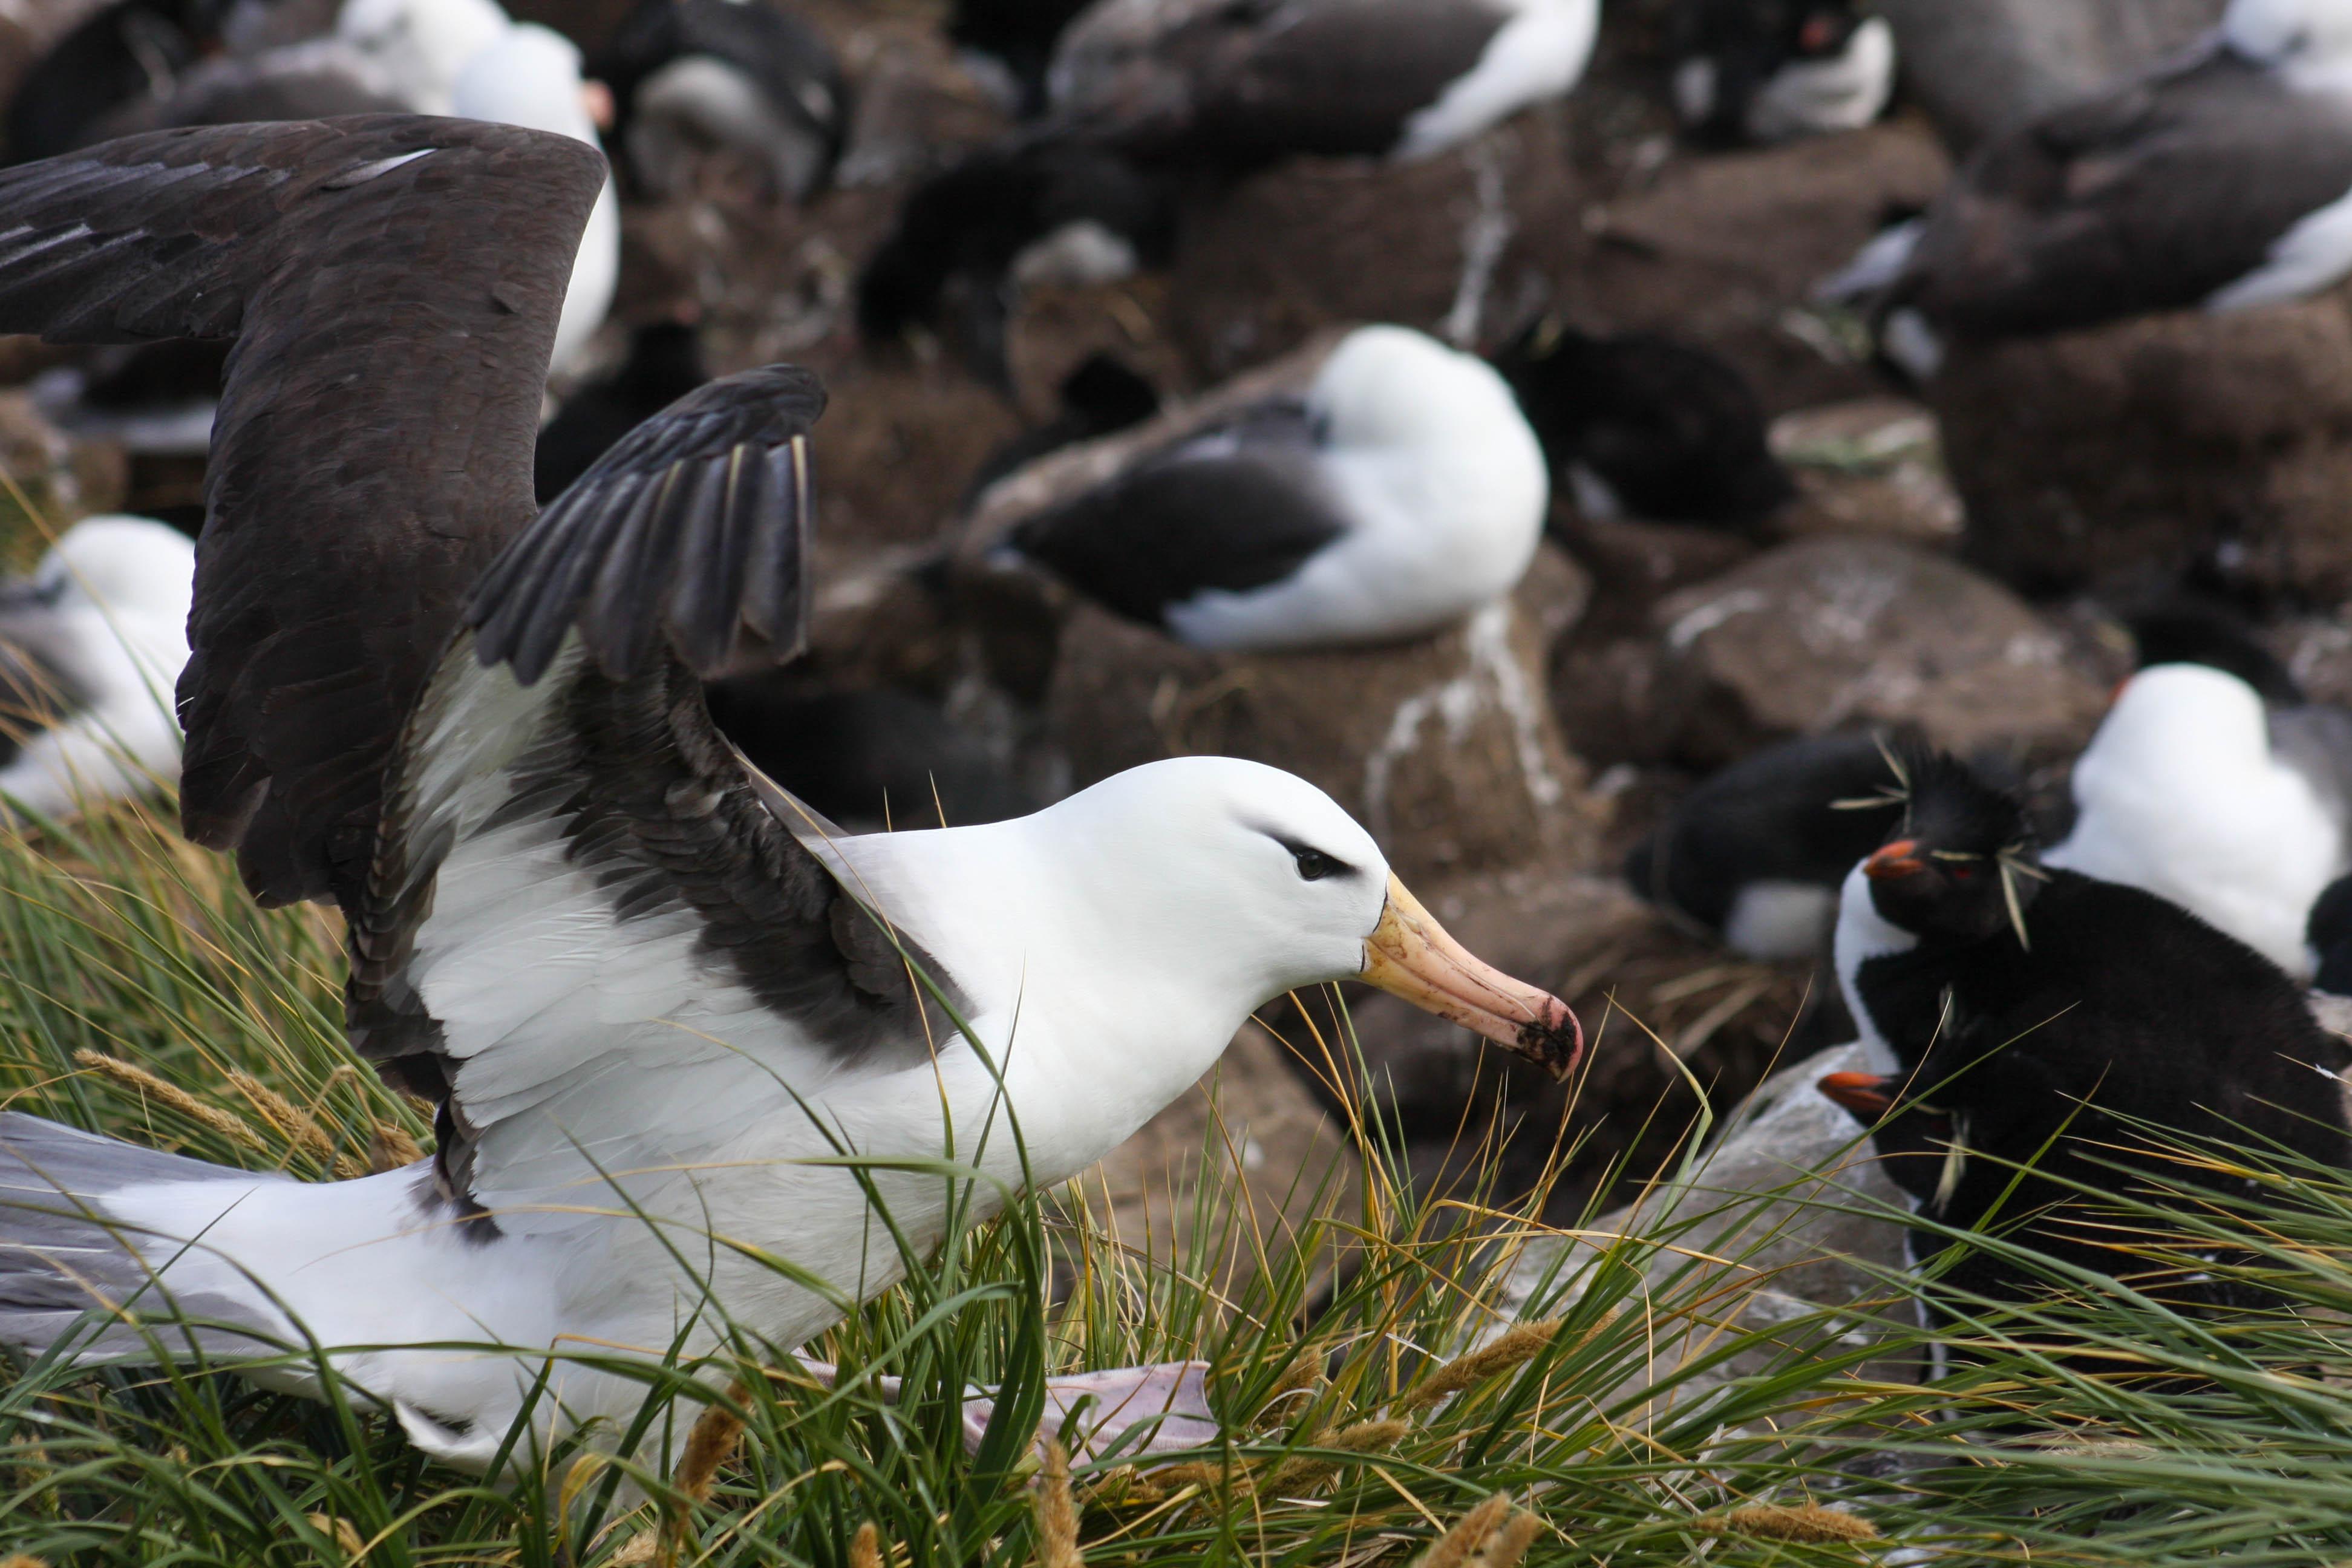 Albatross take off, West Point Island, The Falklands